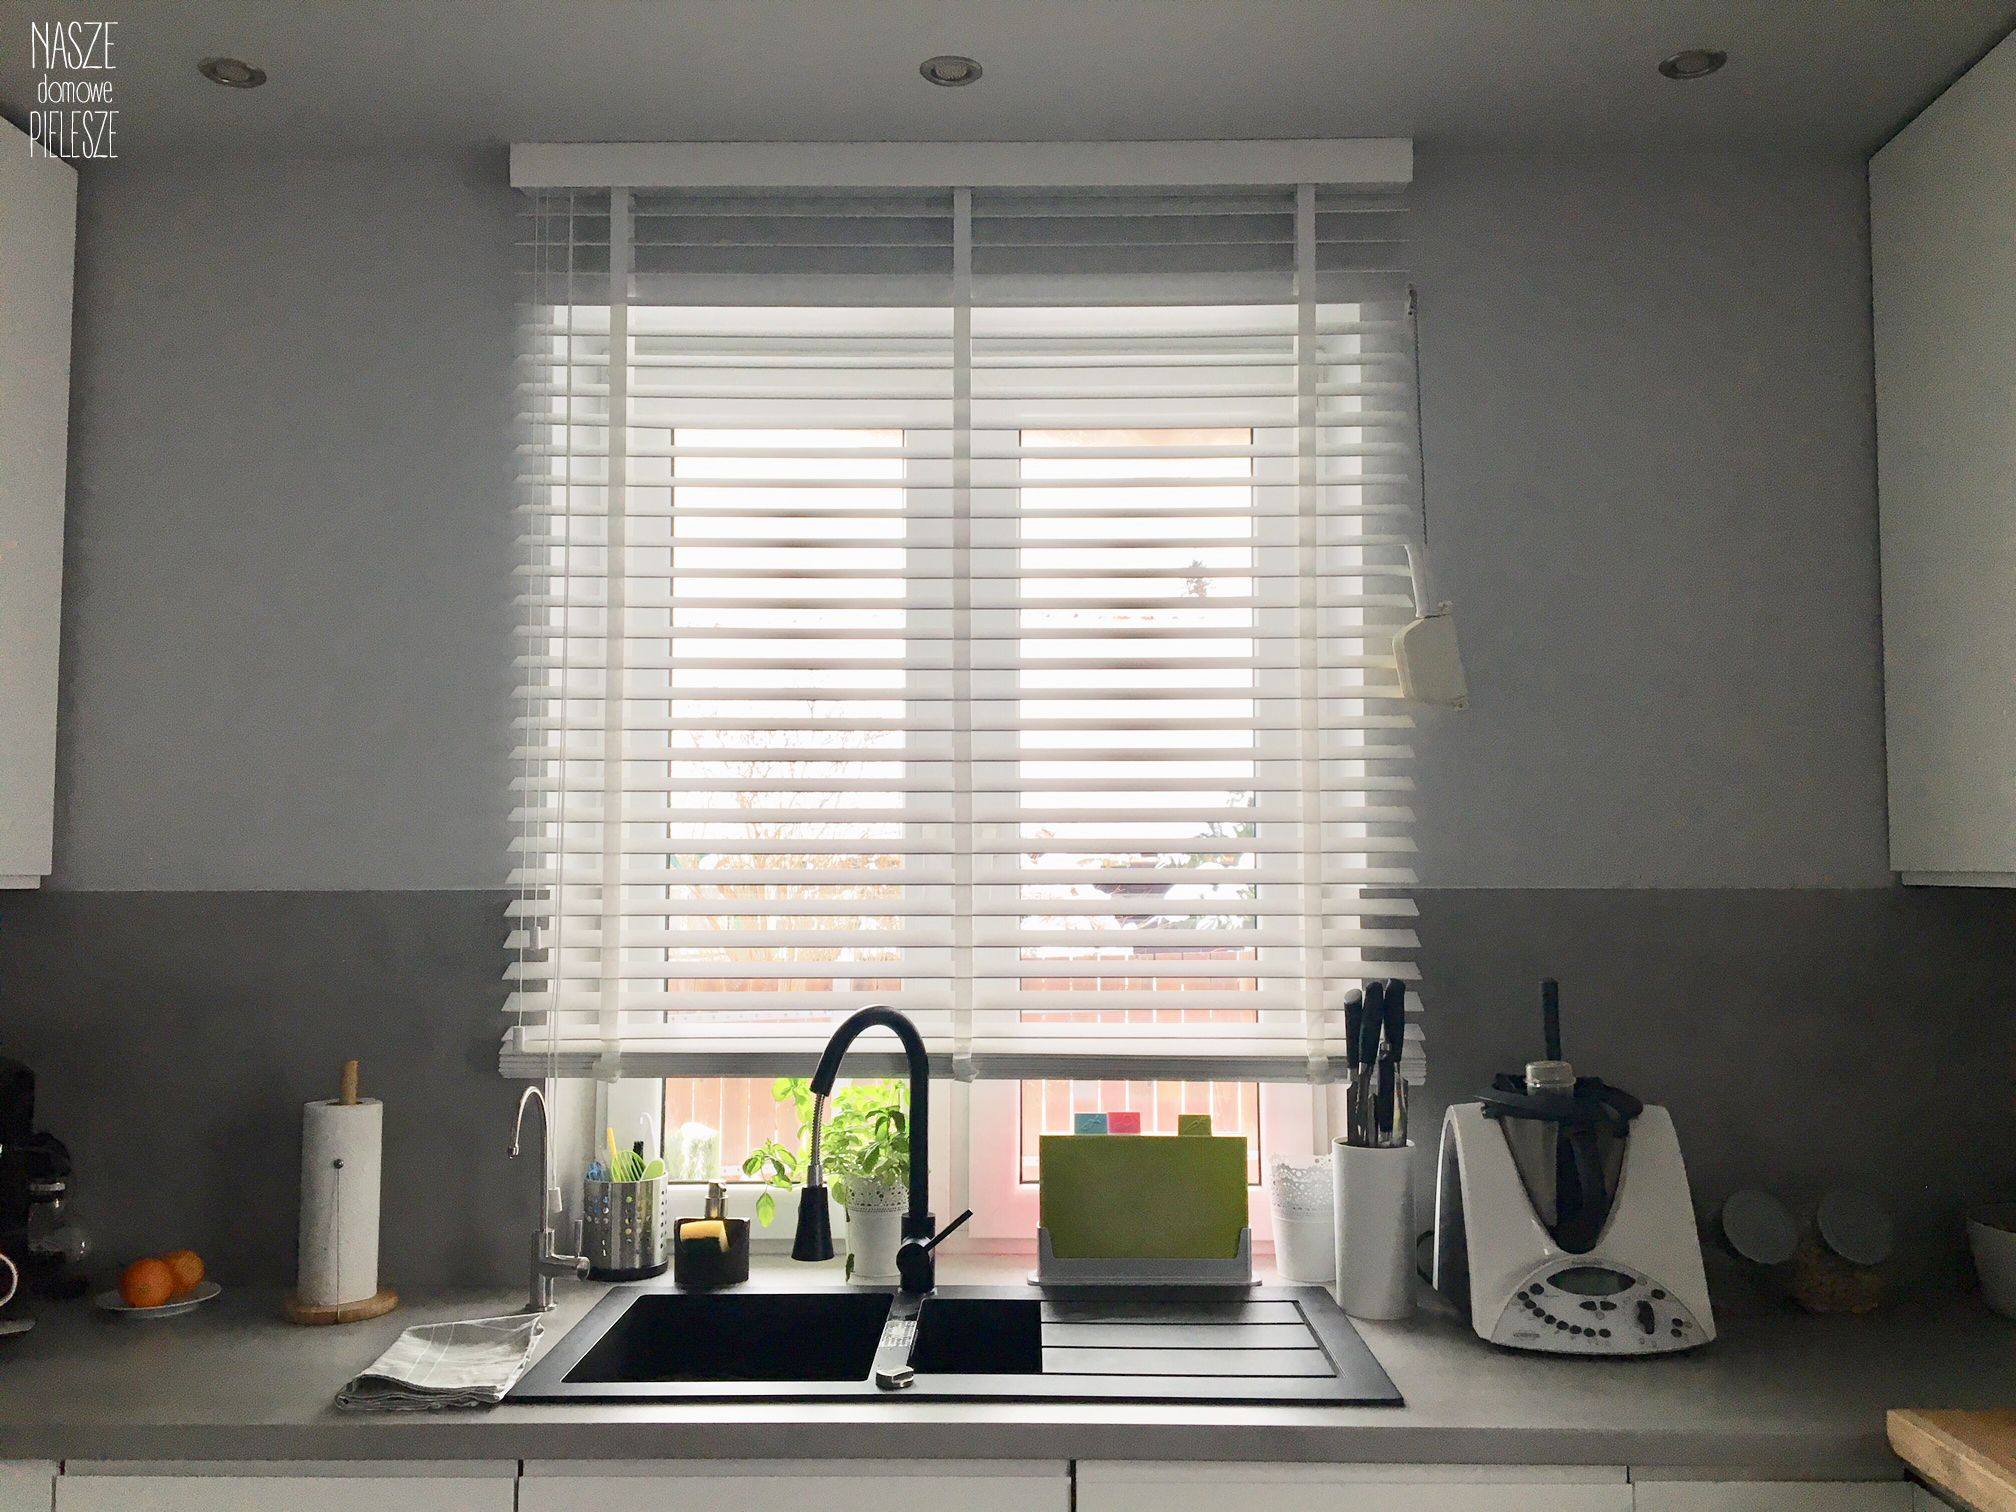 Zaluzje Drewniane W Kuchni Home Home Decor Decor